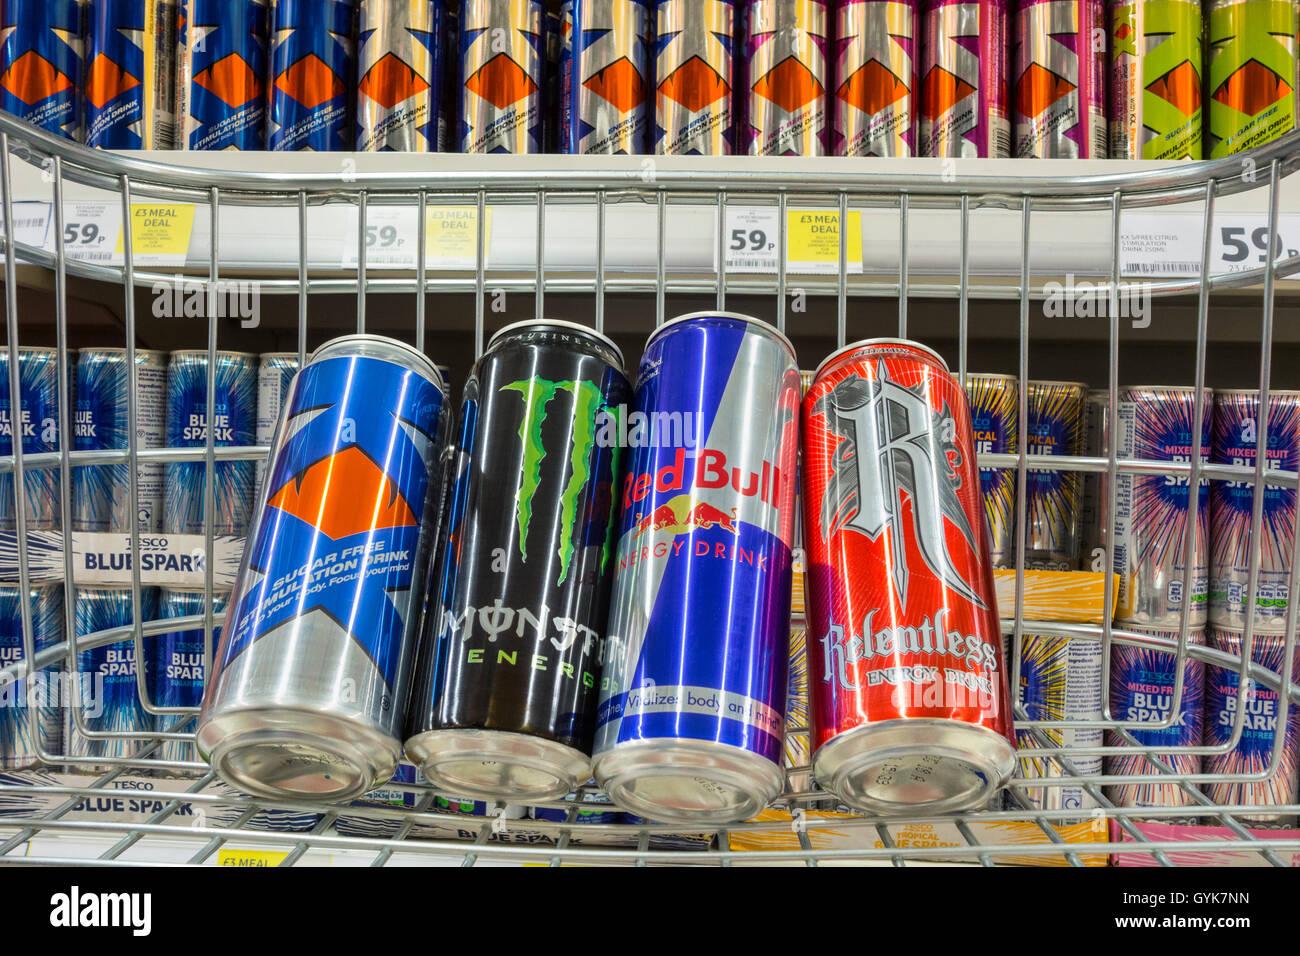 Red Bull Kühlschrank Case : Red bull cans stockfotos & red bull cans bilder alamy